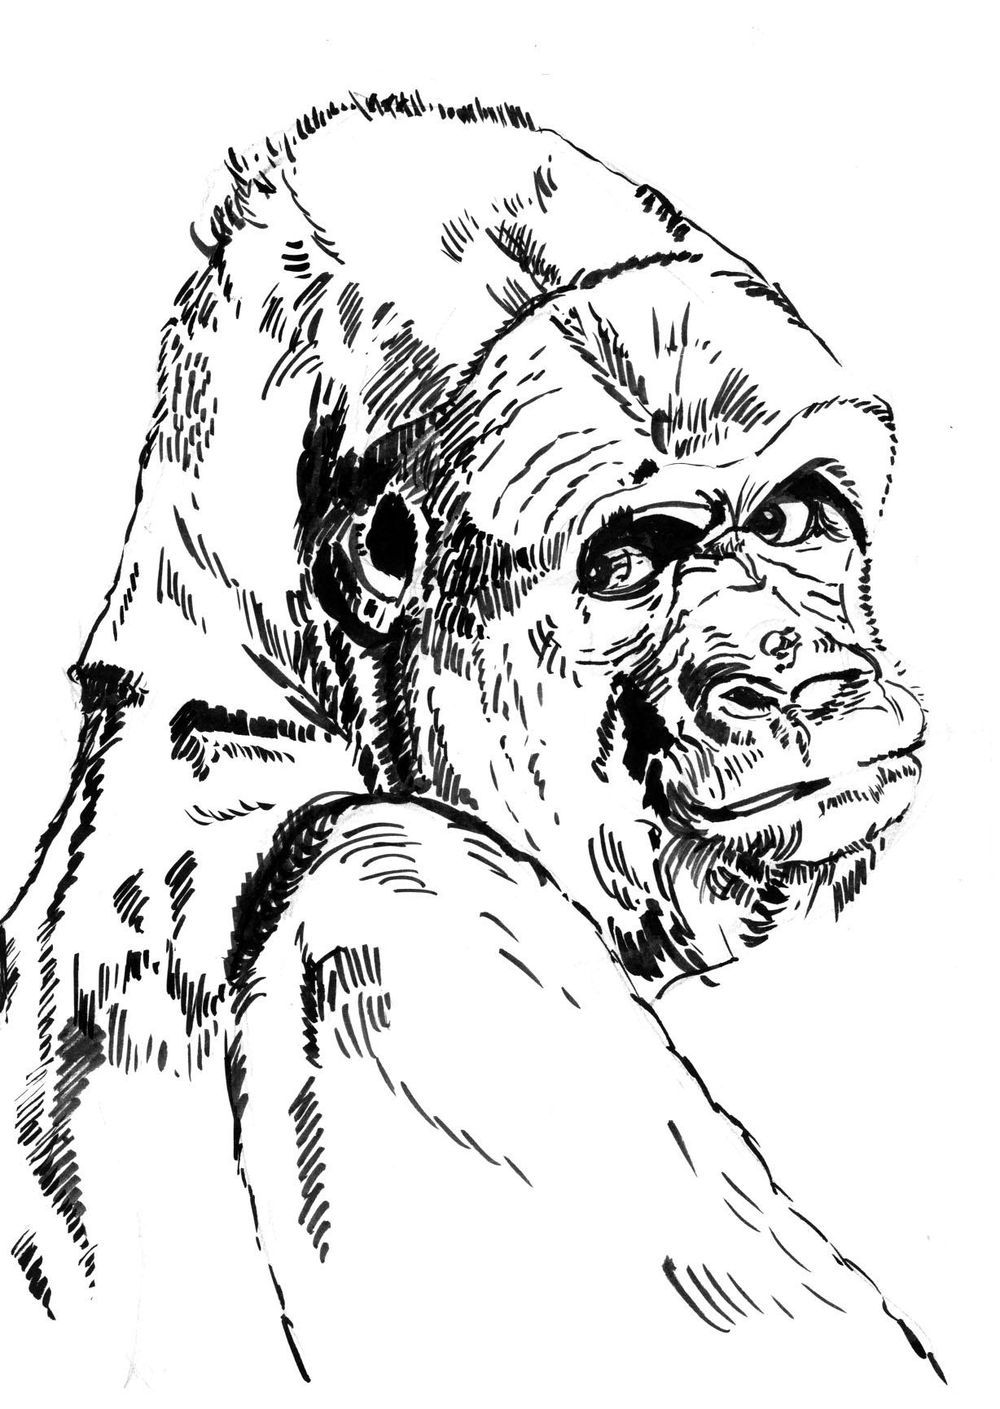 Gorilla - image 2 - student project